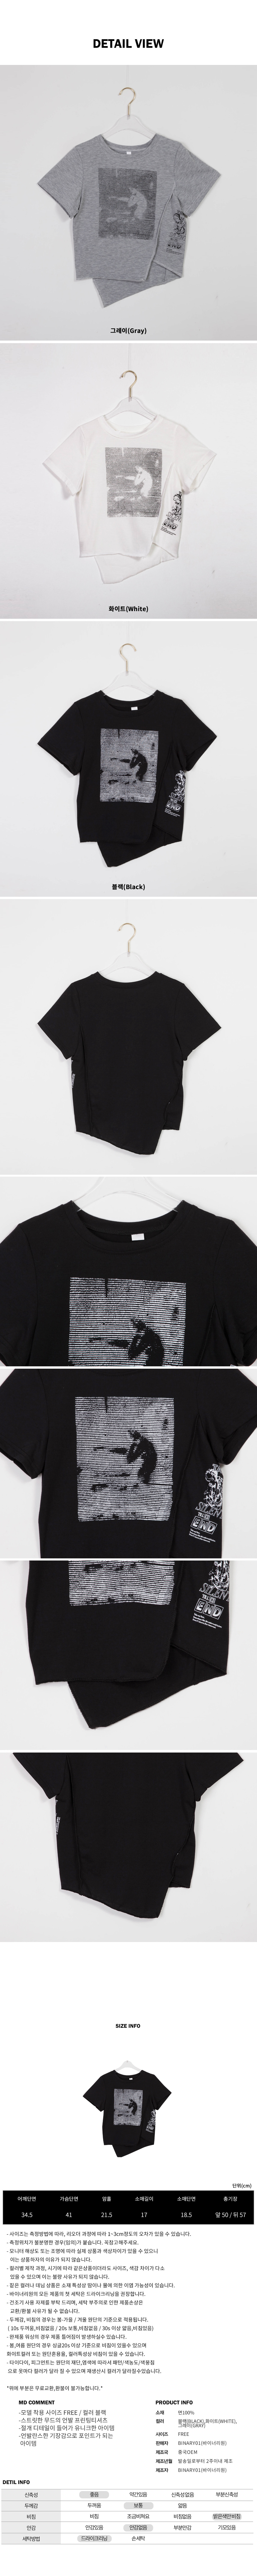 unbale ray print T-shirt